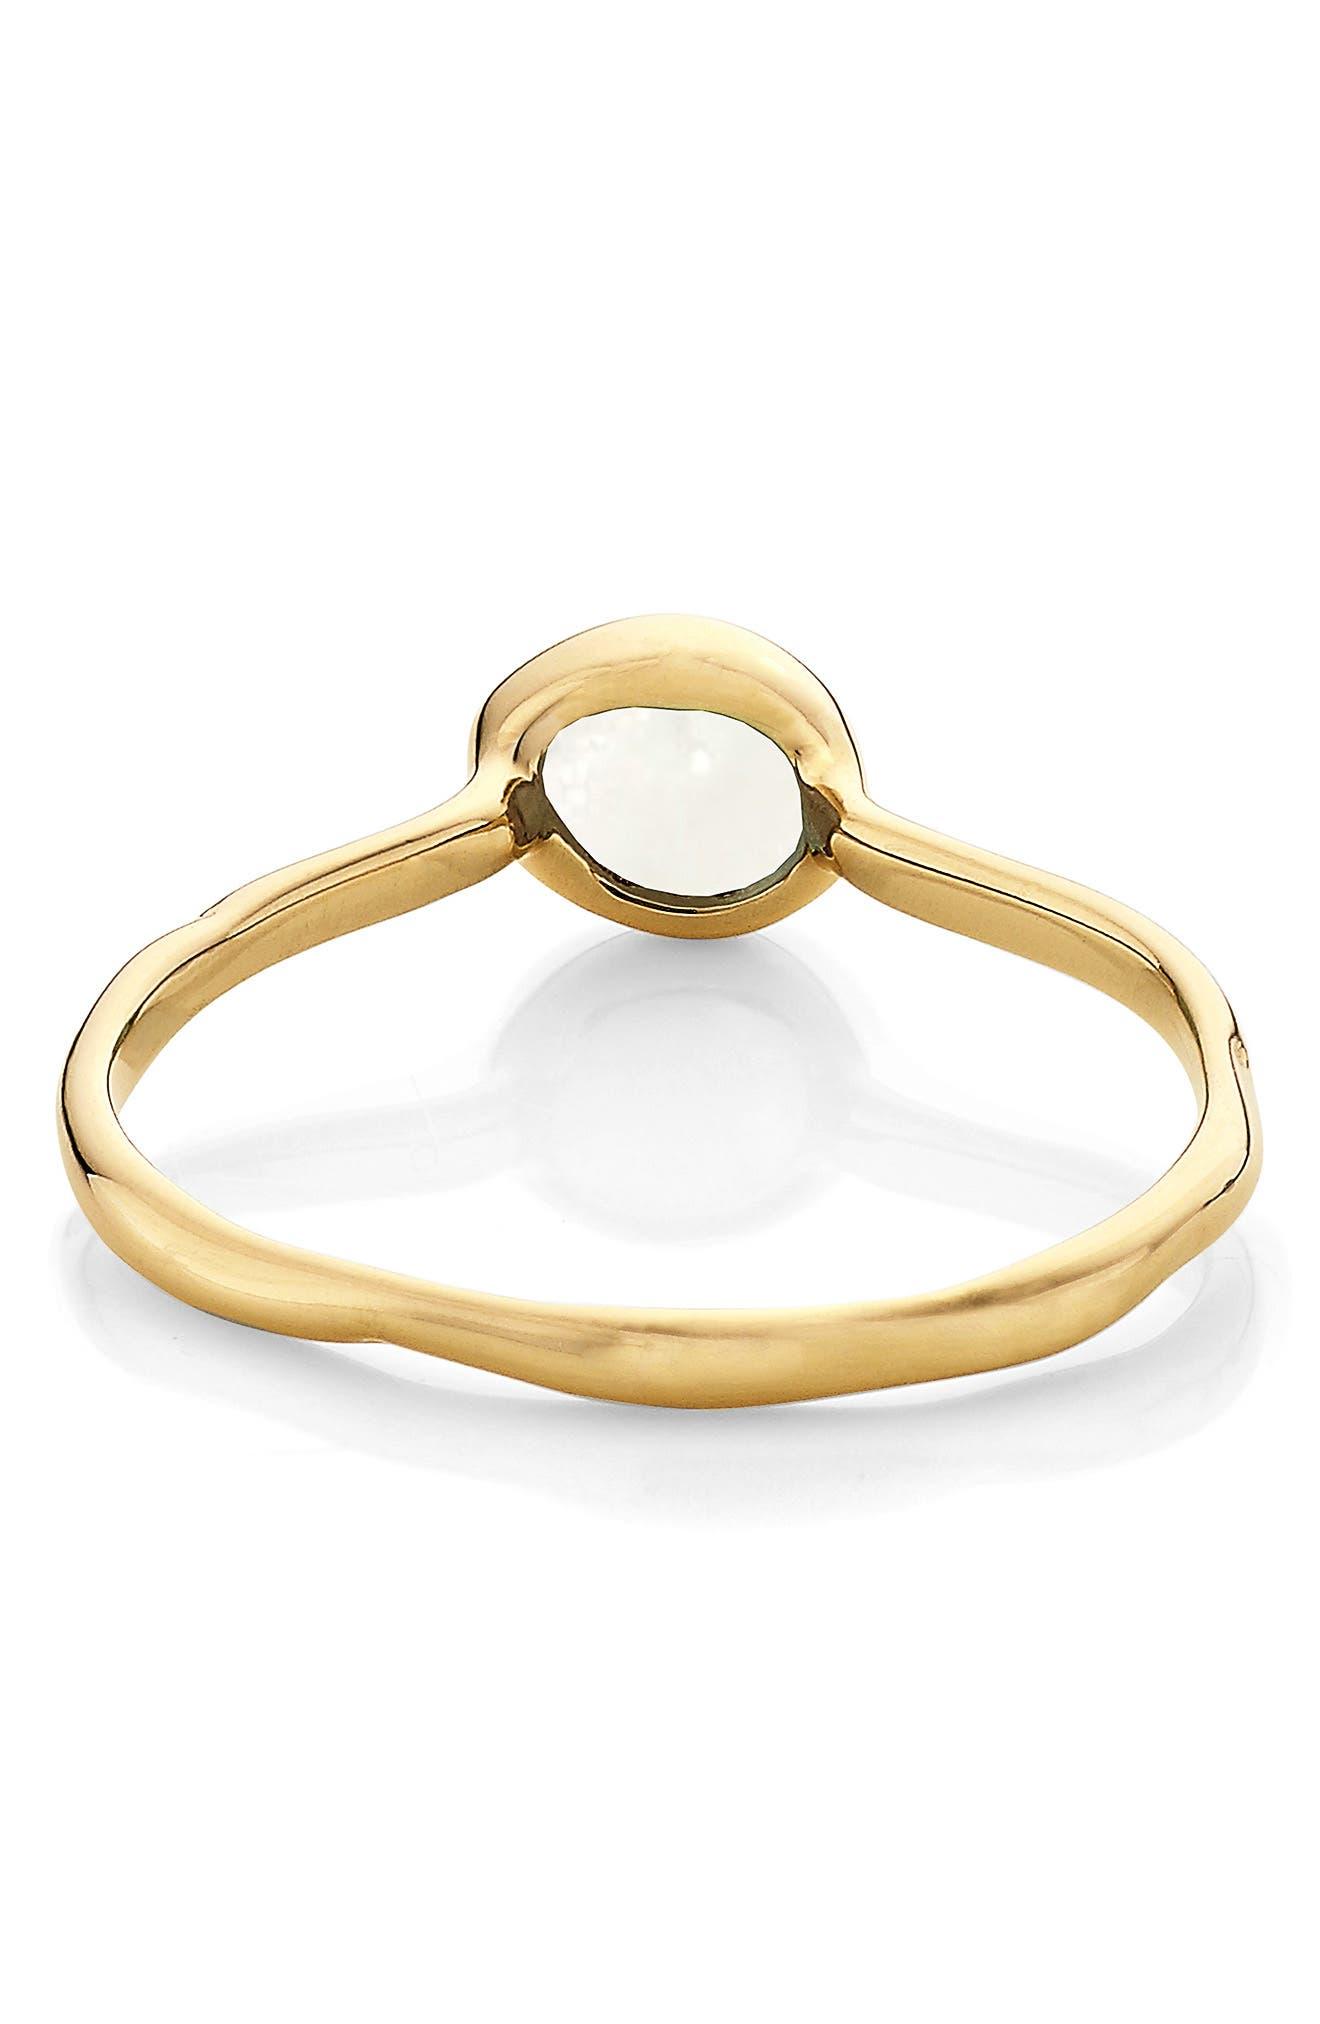 MONICA VINADER, Siren Small Semiprecious Stone Stacking Ring, Alternate thumbnail 3, color, GOLD/ MOONSTONE